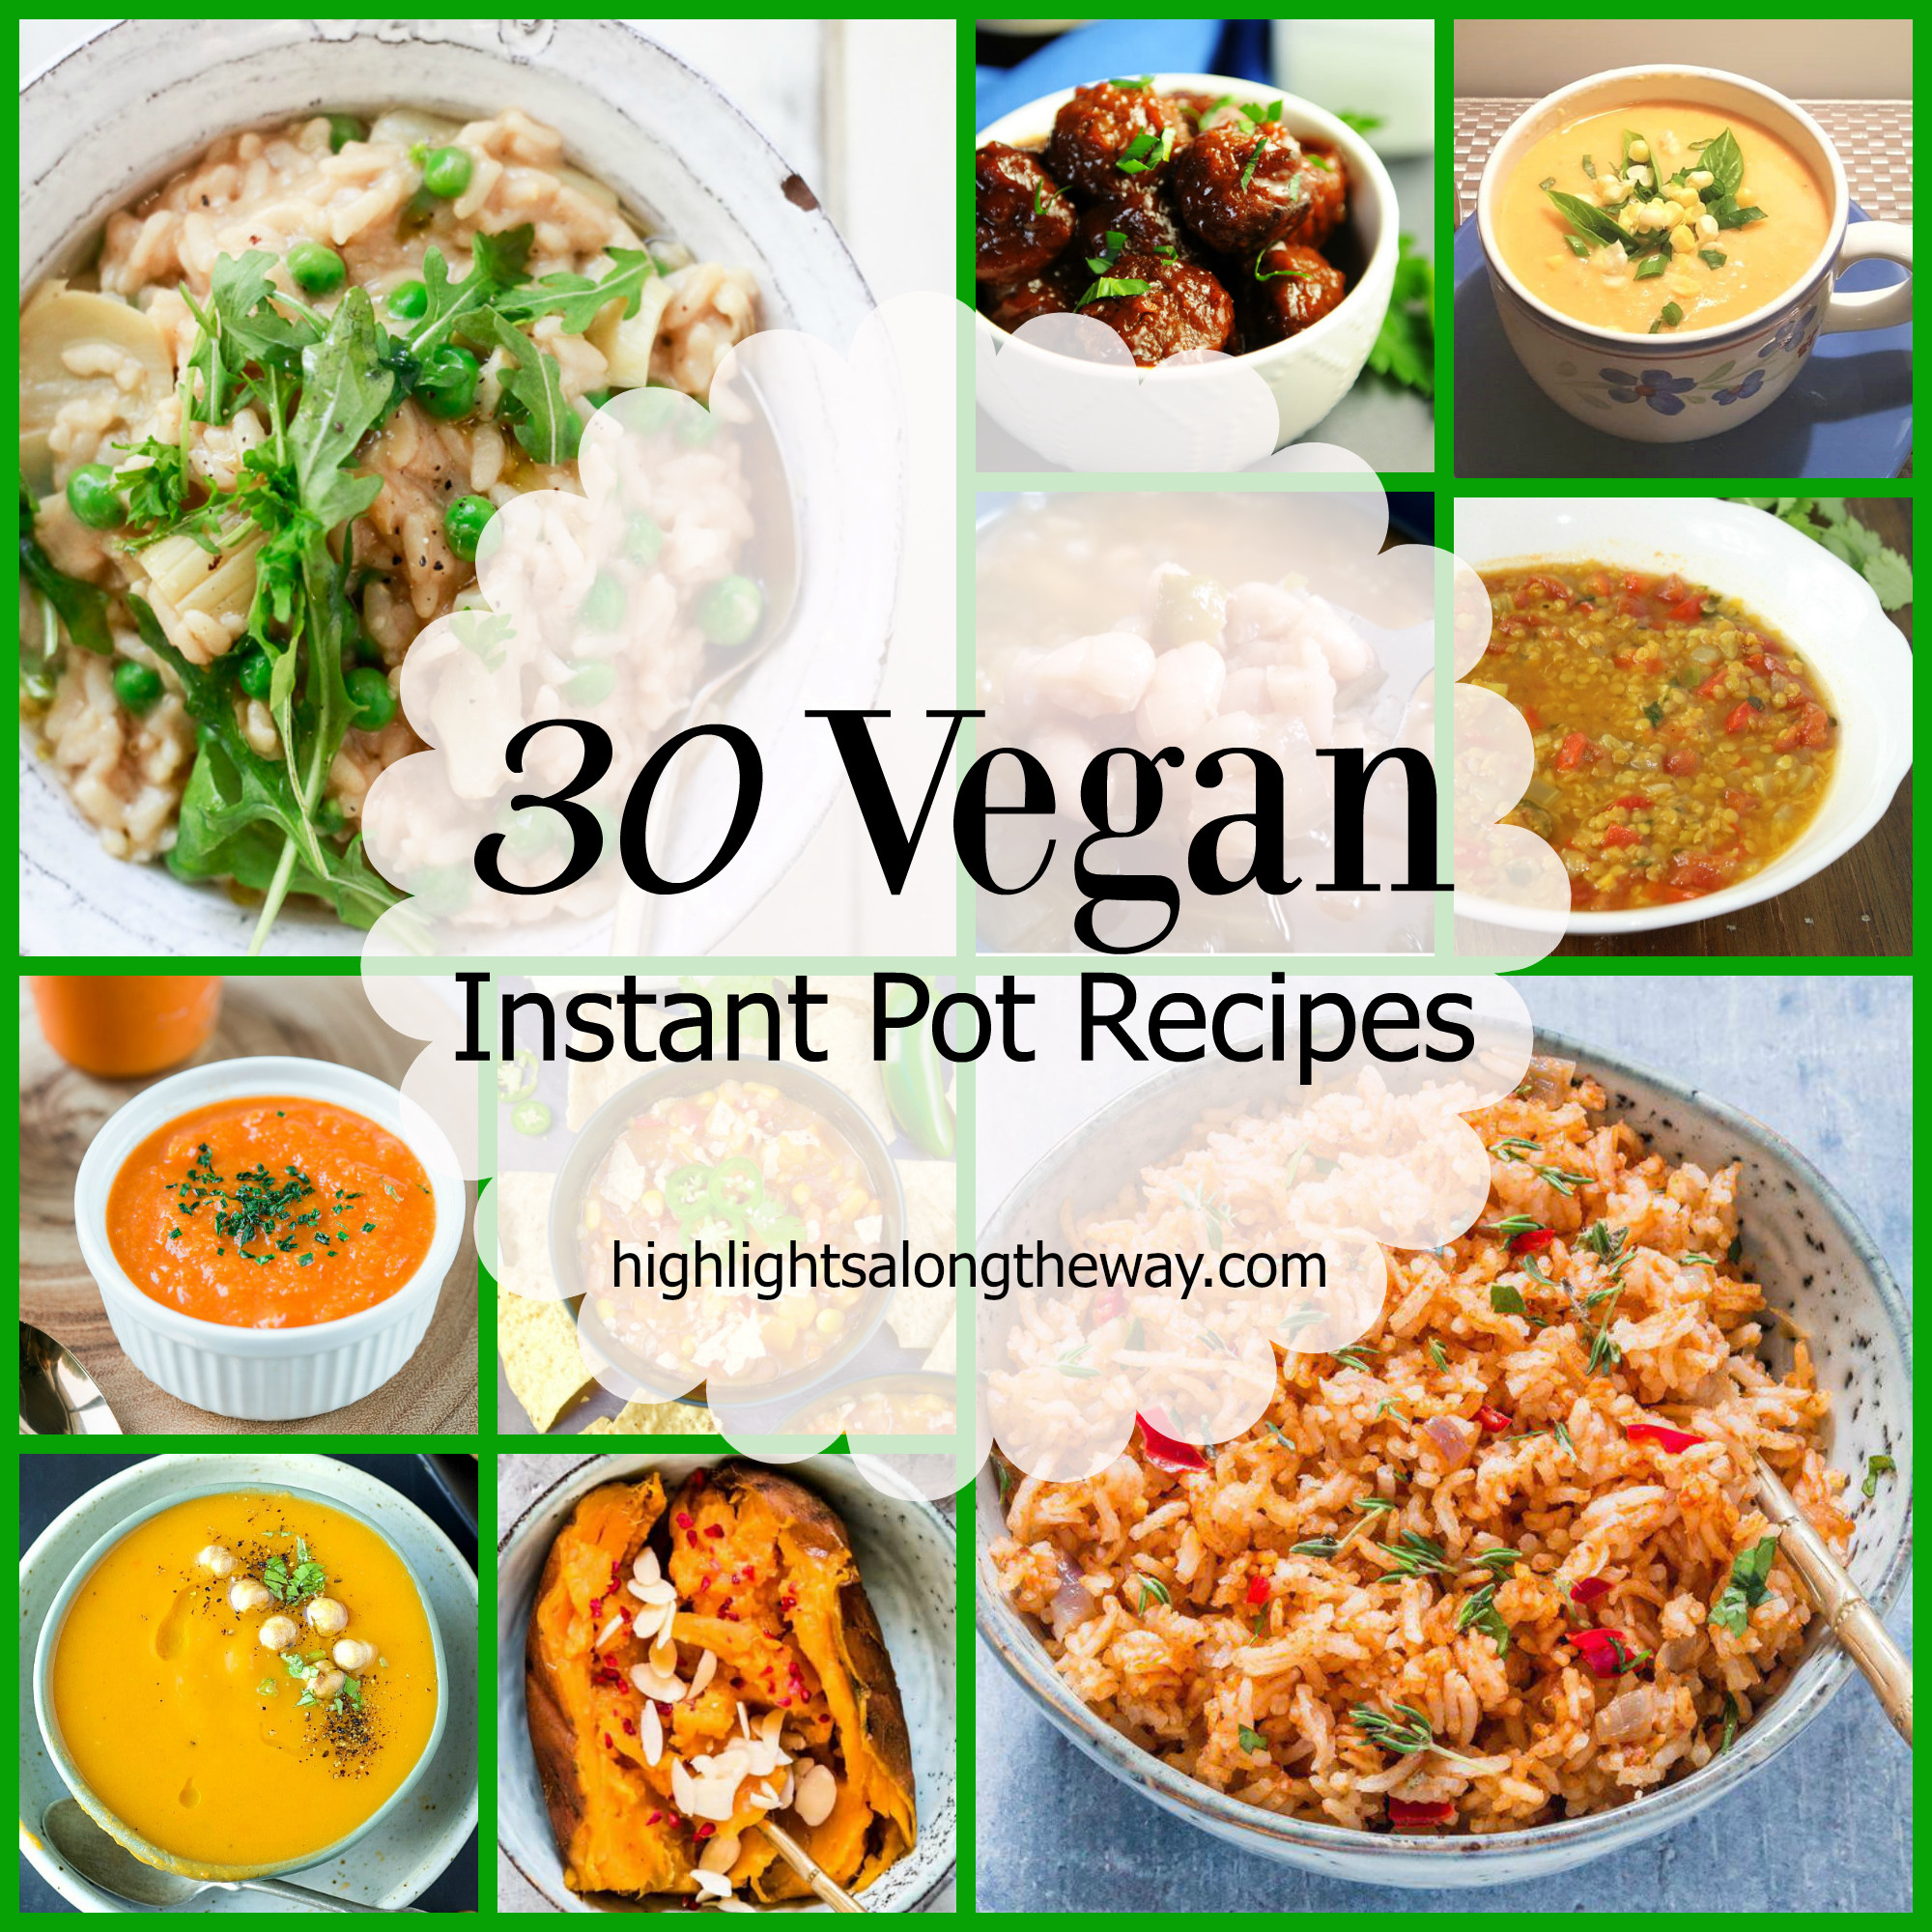 Easy Instant Pot Recipes Vegetarian  Easy Vegan Instant Pot recipes Plant based recipes for